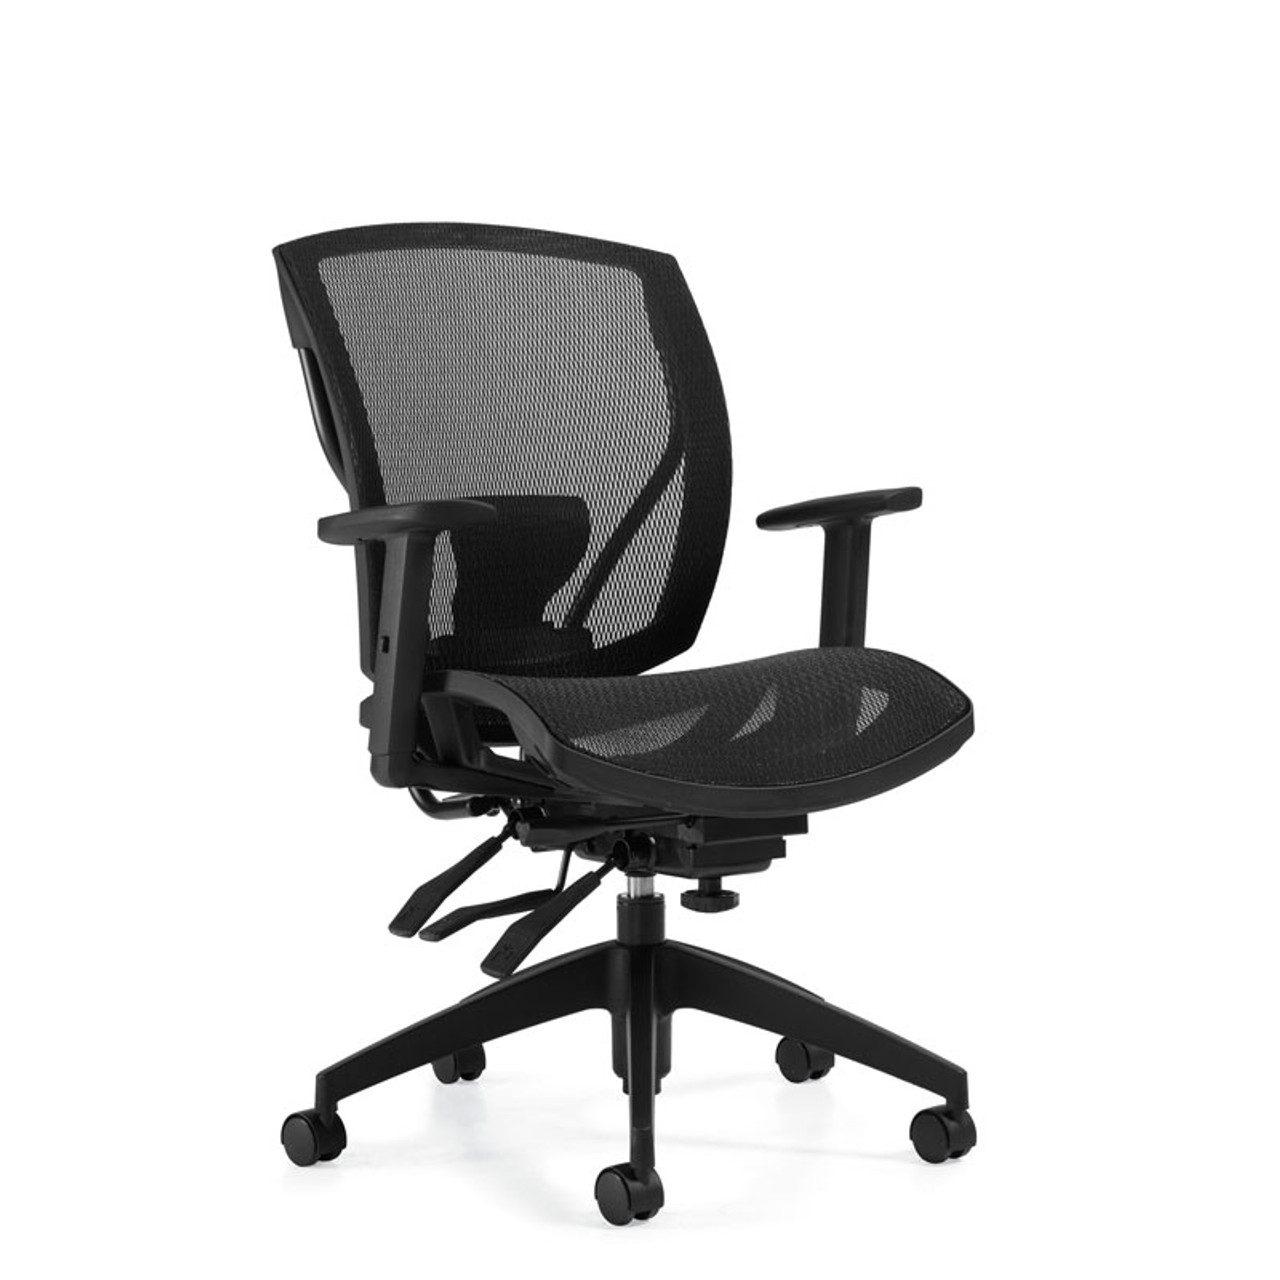 Ibex ergonomic chair - shown with mesh seat